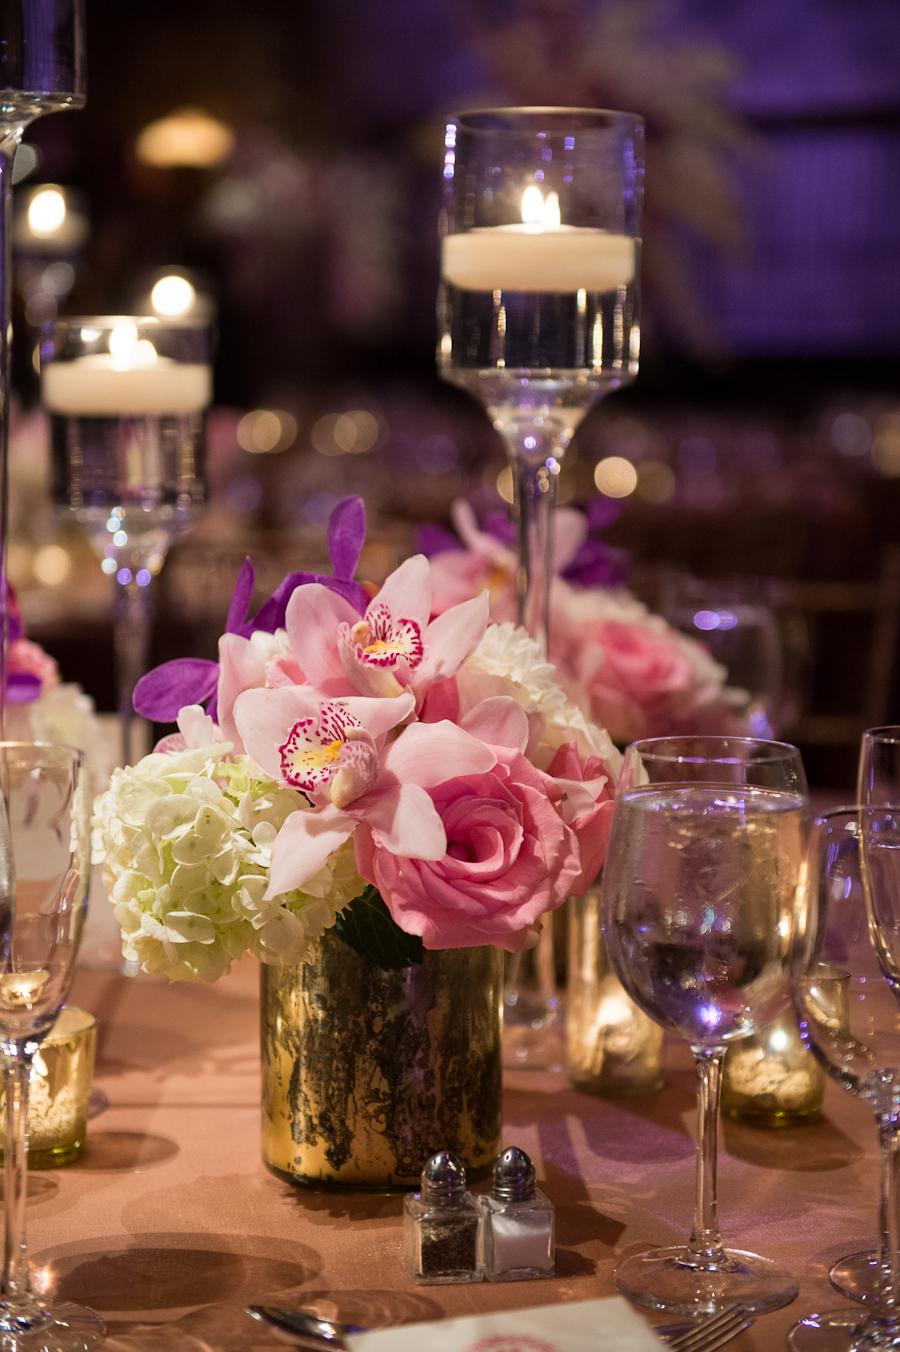 gotham hall brian hatton ang weddings and events-38.jpg